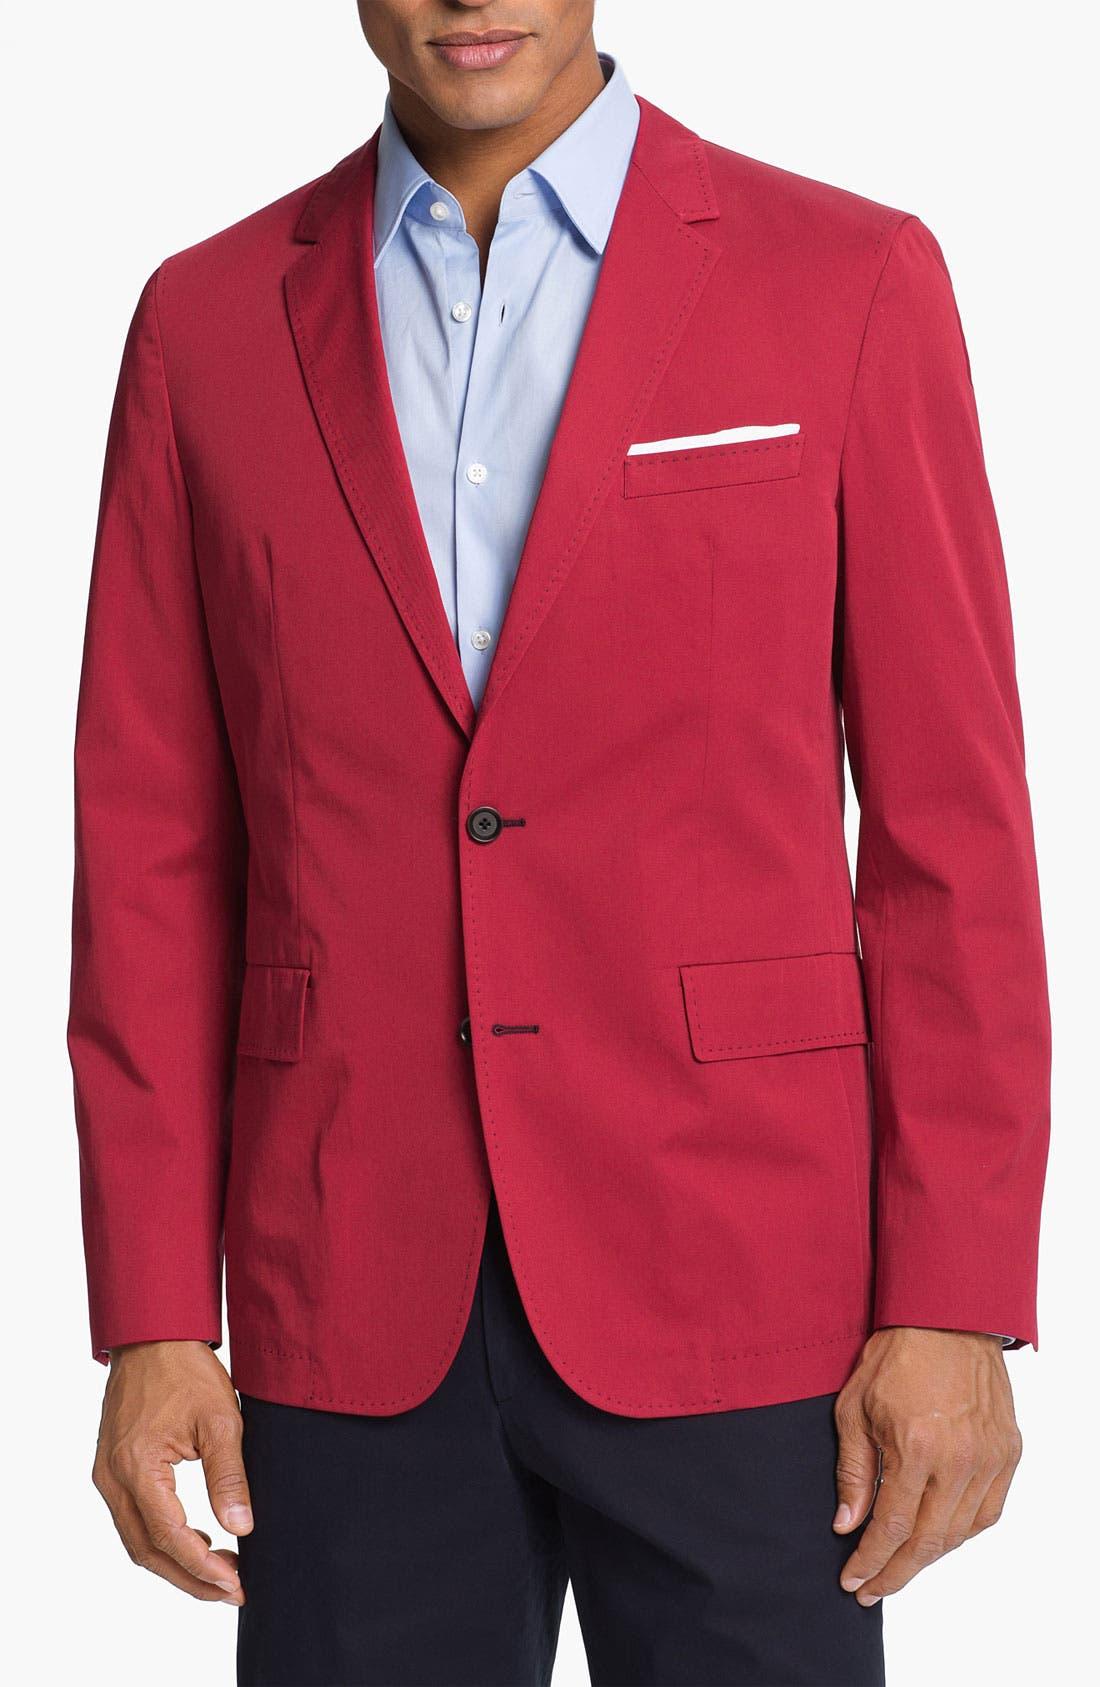 Main Image - BOSS HUGO BOSS 'Miles' Trim Fit Cotton Blazer (Online Only)